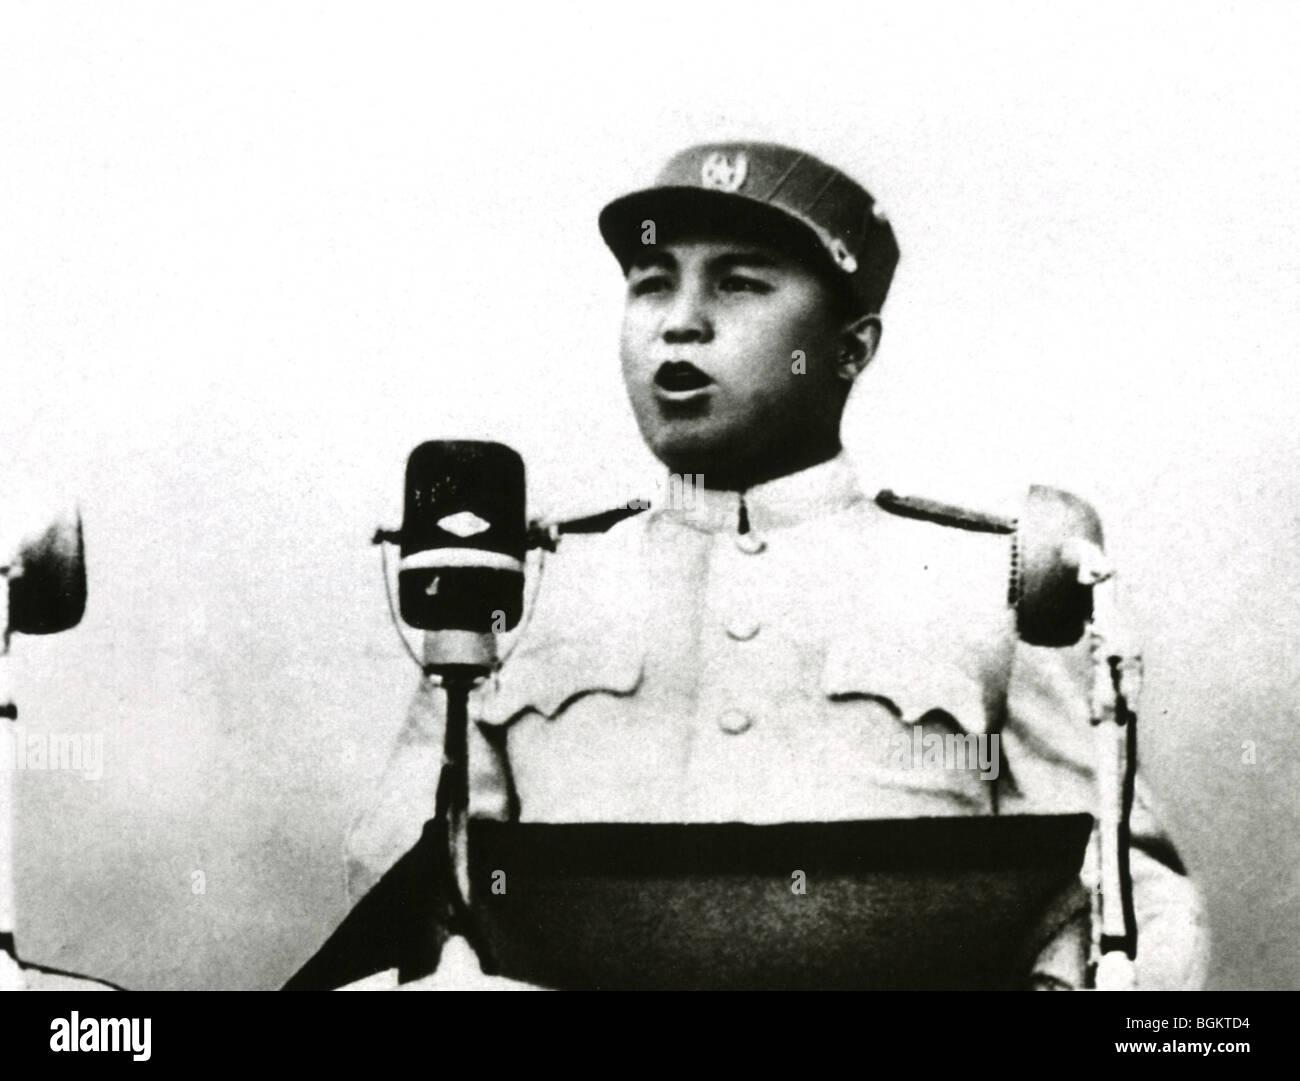 KIM II-SUNG  - North Korean Communist leader (1912-1994) - Stock Image